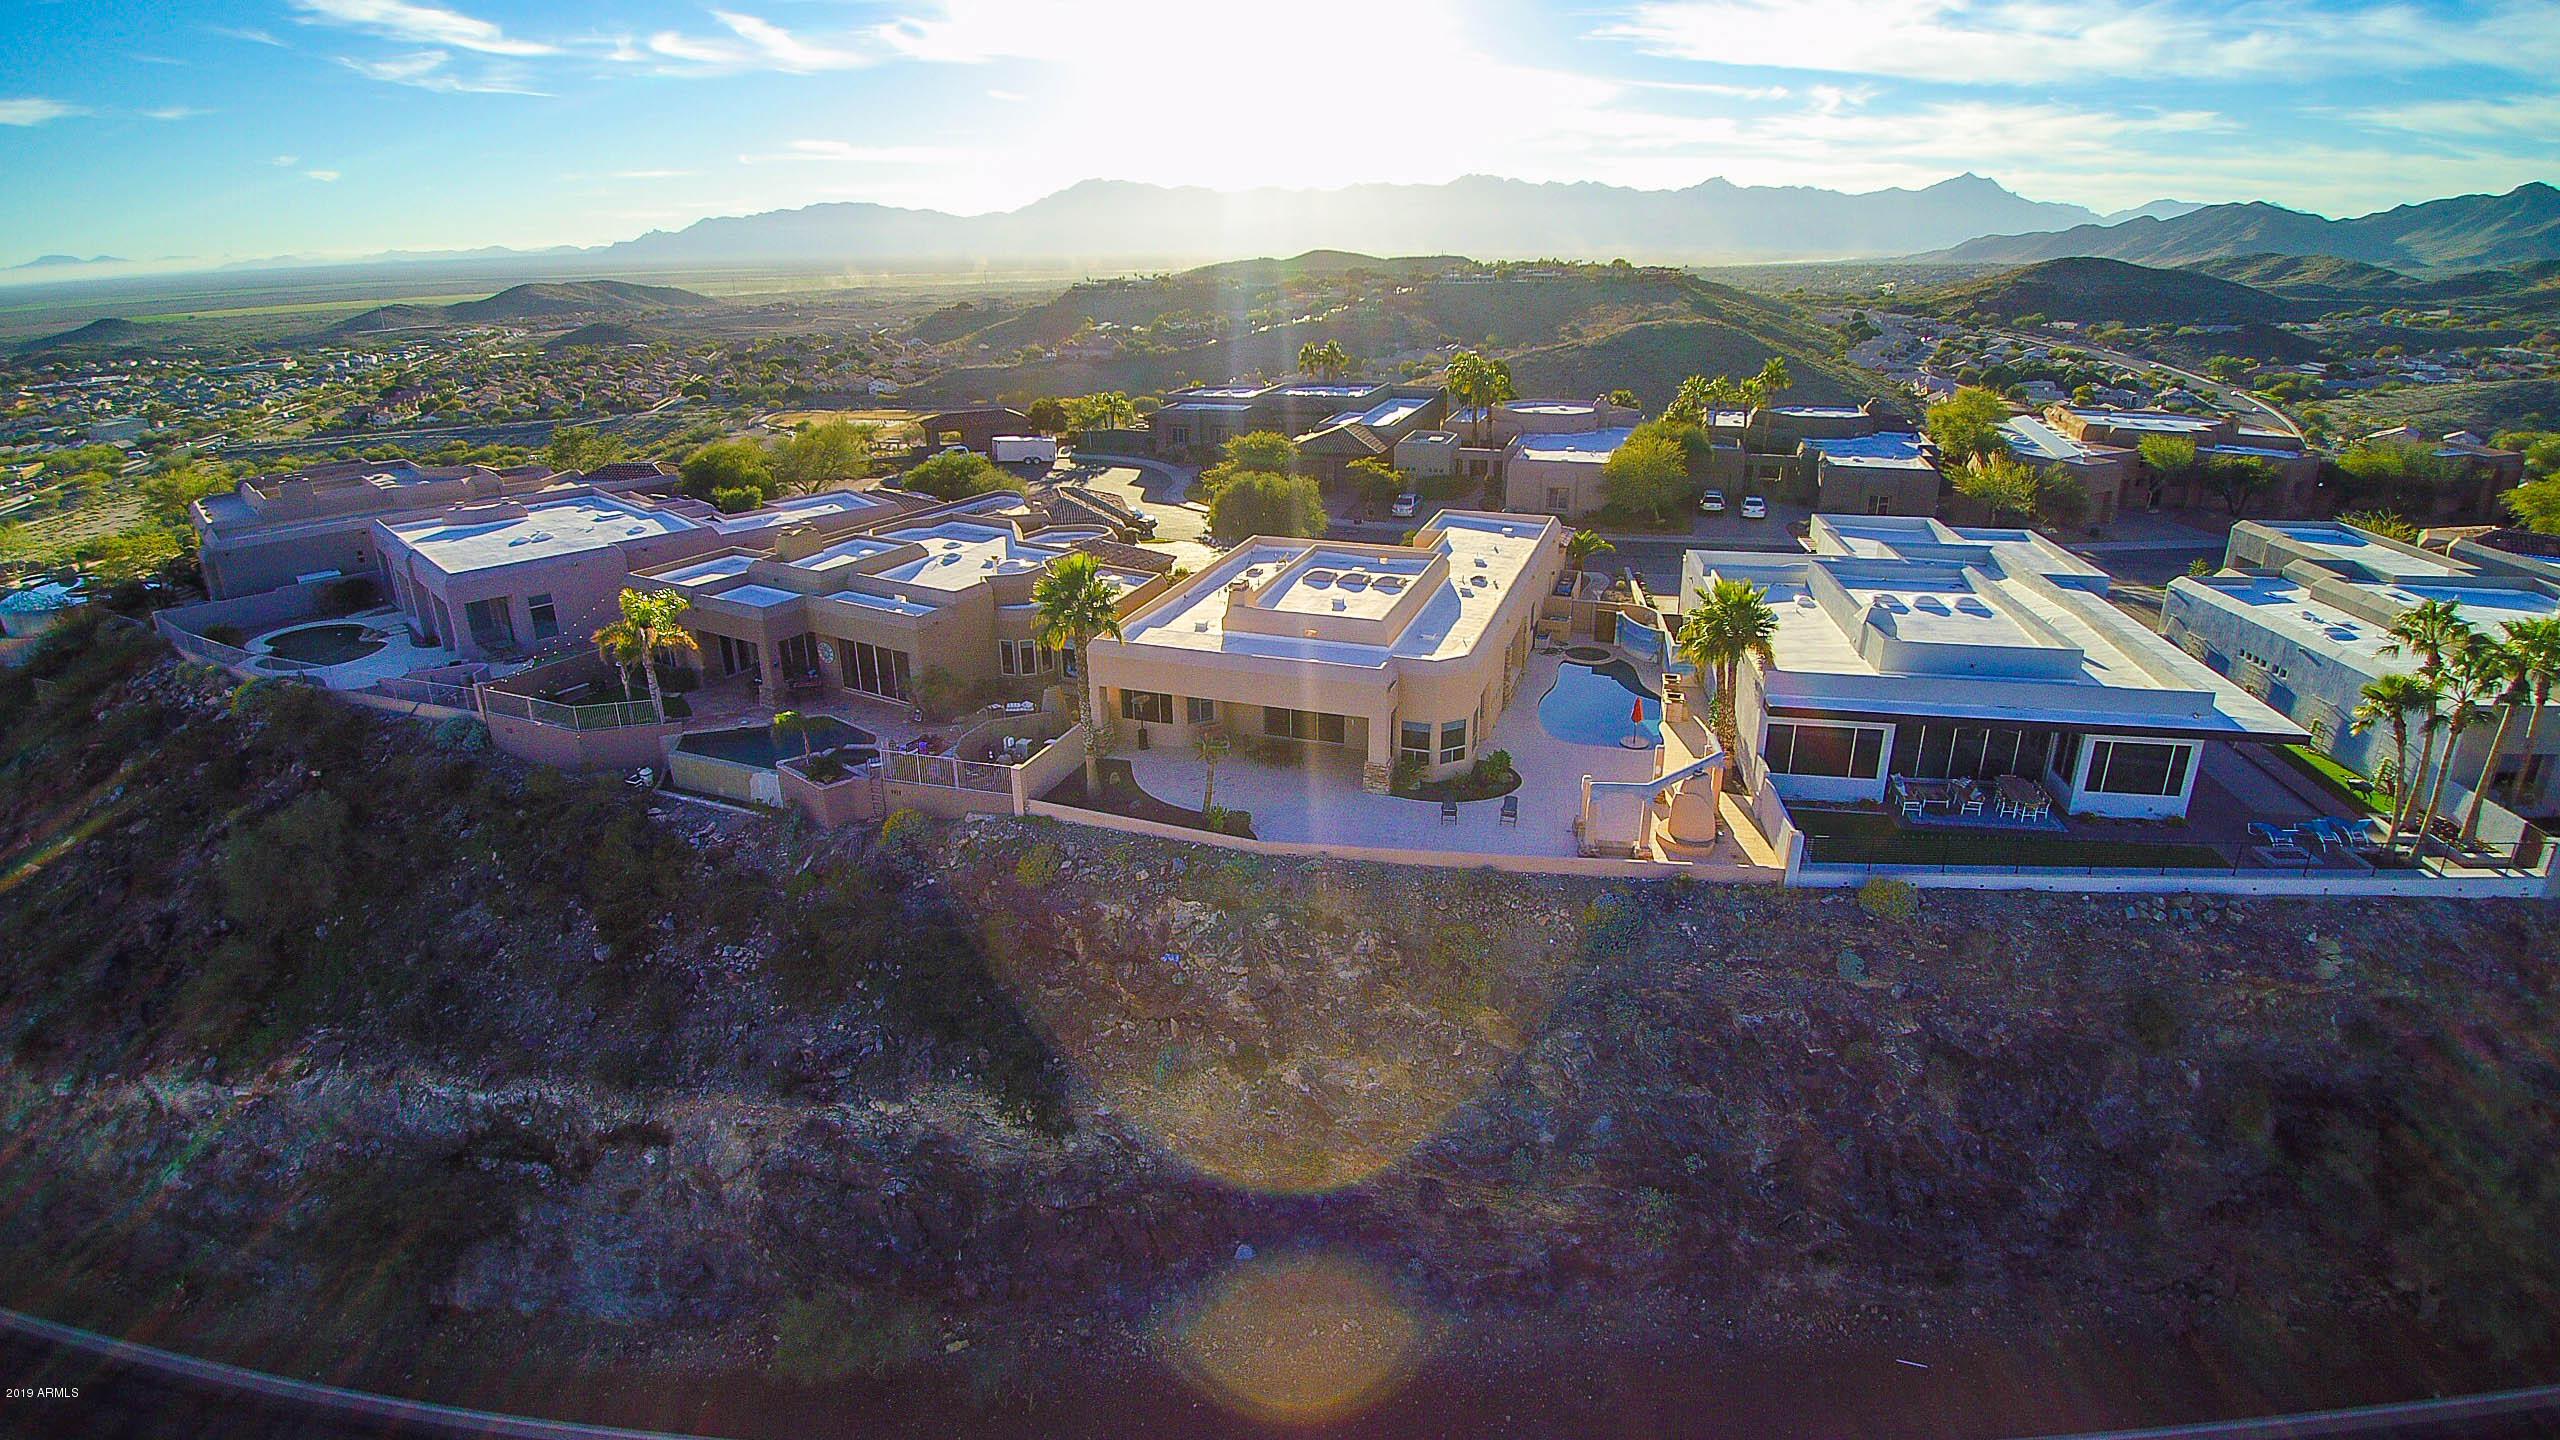 MLS 5859893 1126 E THUNDERHILL Place, Phoenix, AZ 85048 Ahwatukee Community AZ Single-Story